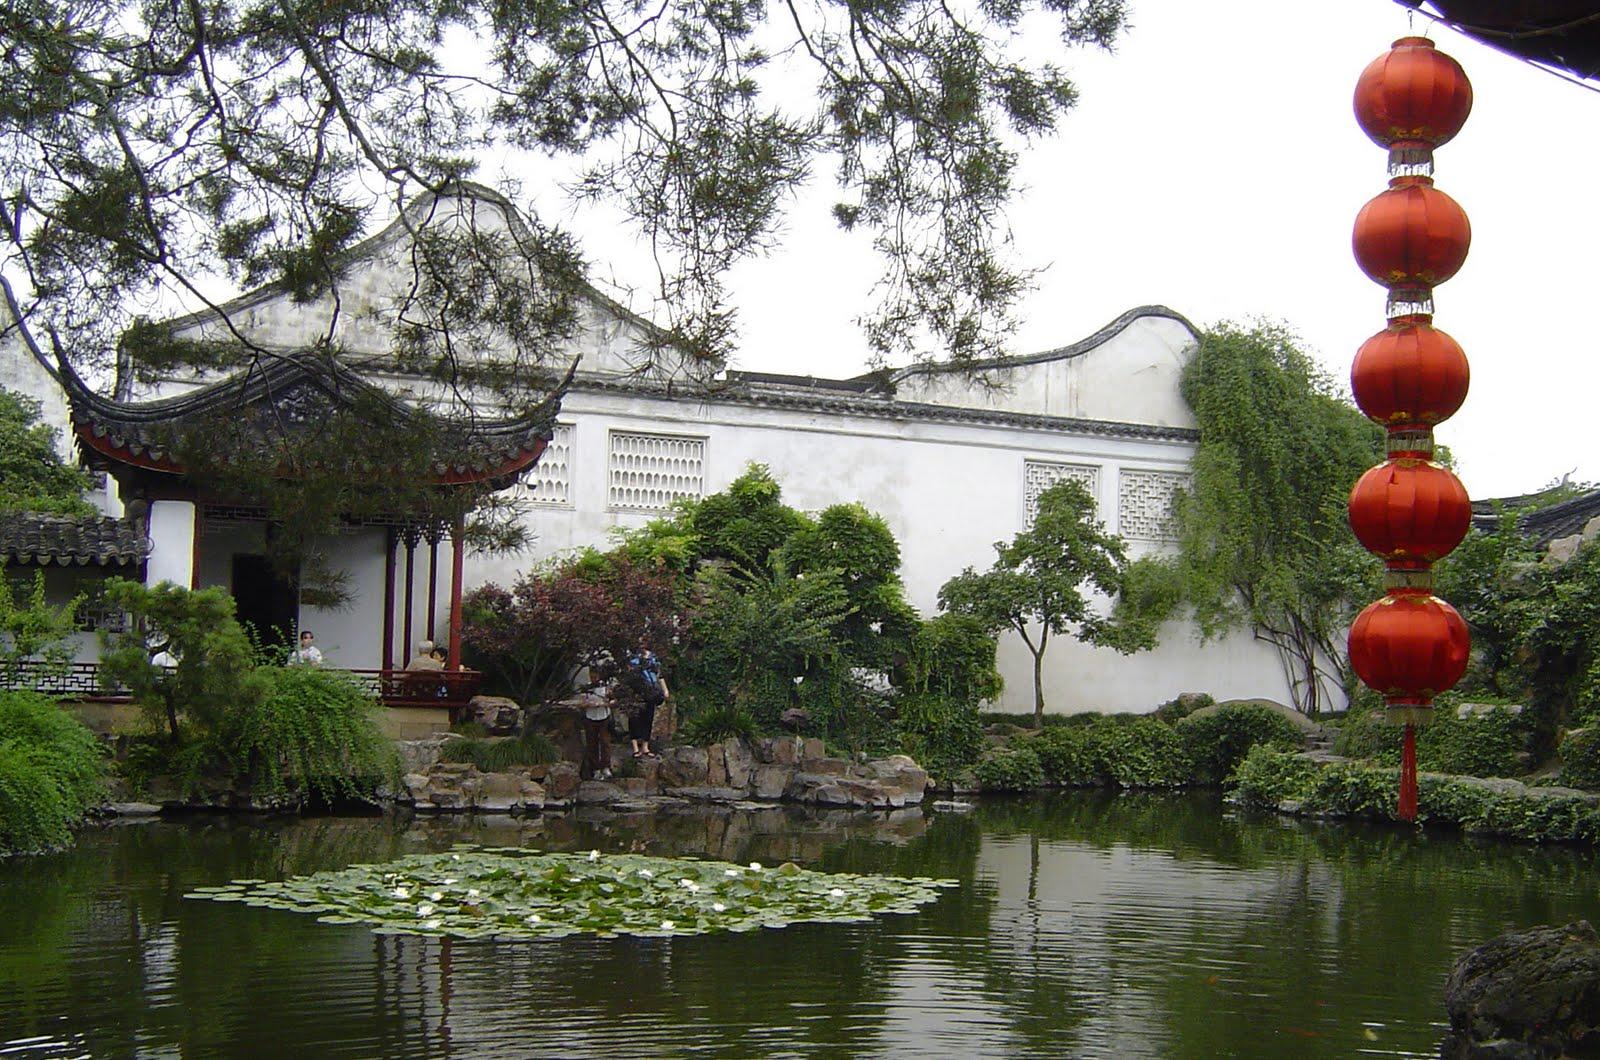 Destination Tour Suzhou China